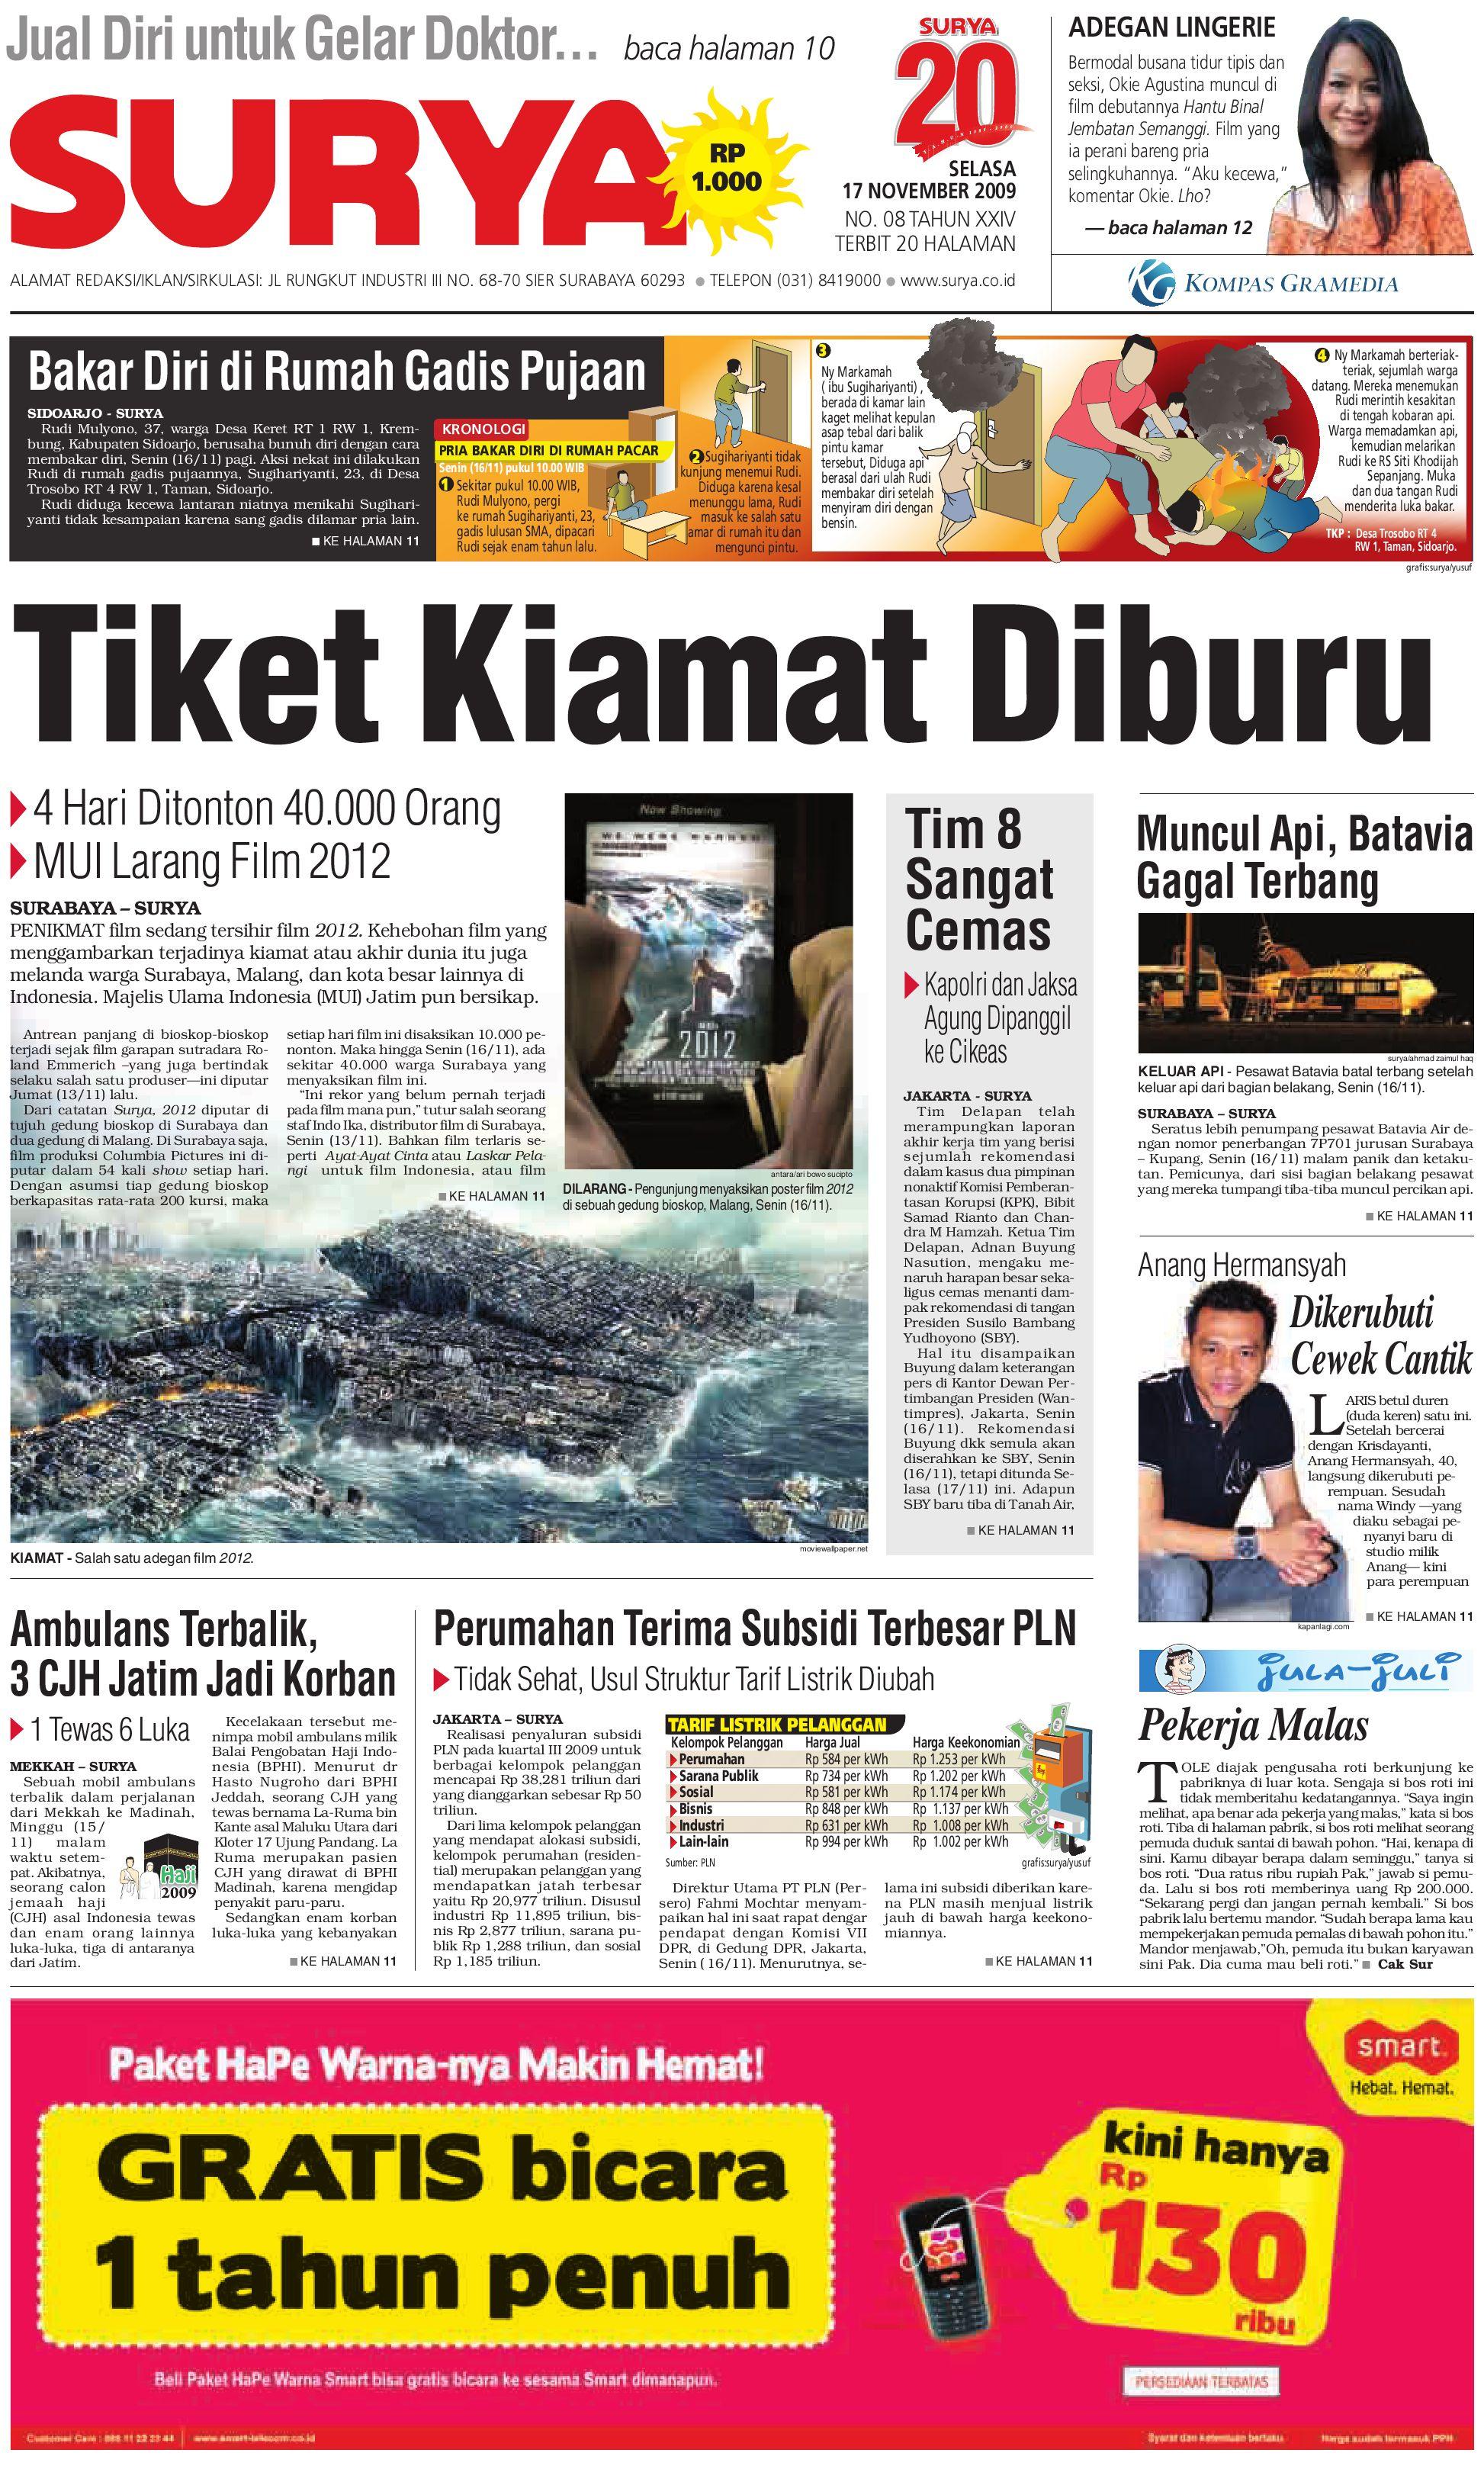 Surya Edisi Cetak 17 Nov 2009 Produk Ukm Bumn Batik Lengan Panjang Parang Toko Ngremboko